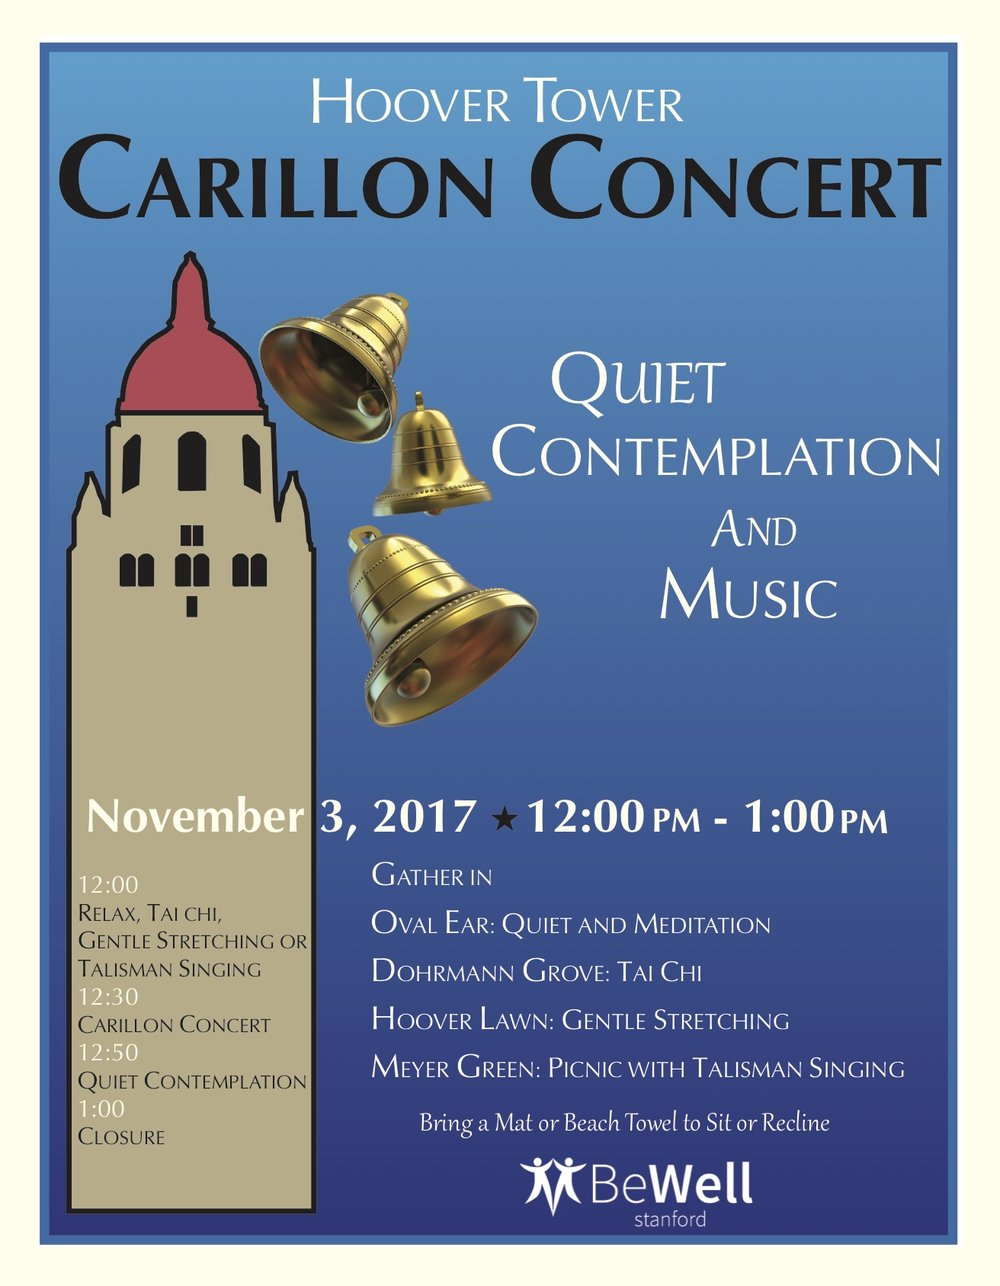 Carillon Concert Flyer_2017.jpg